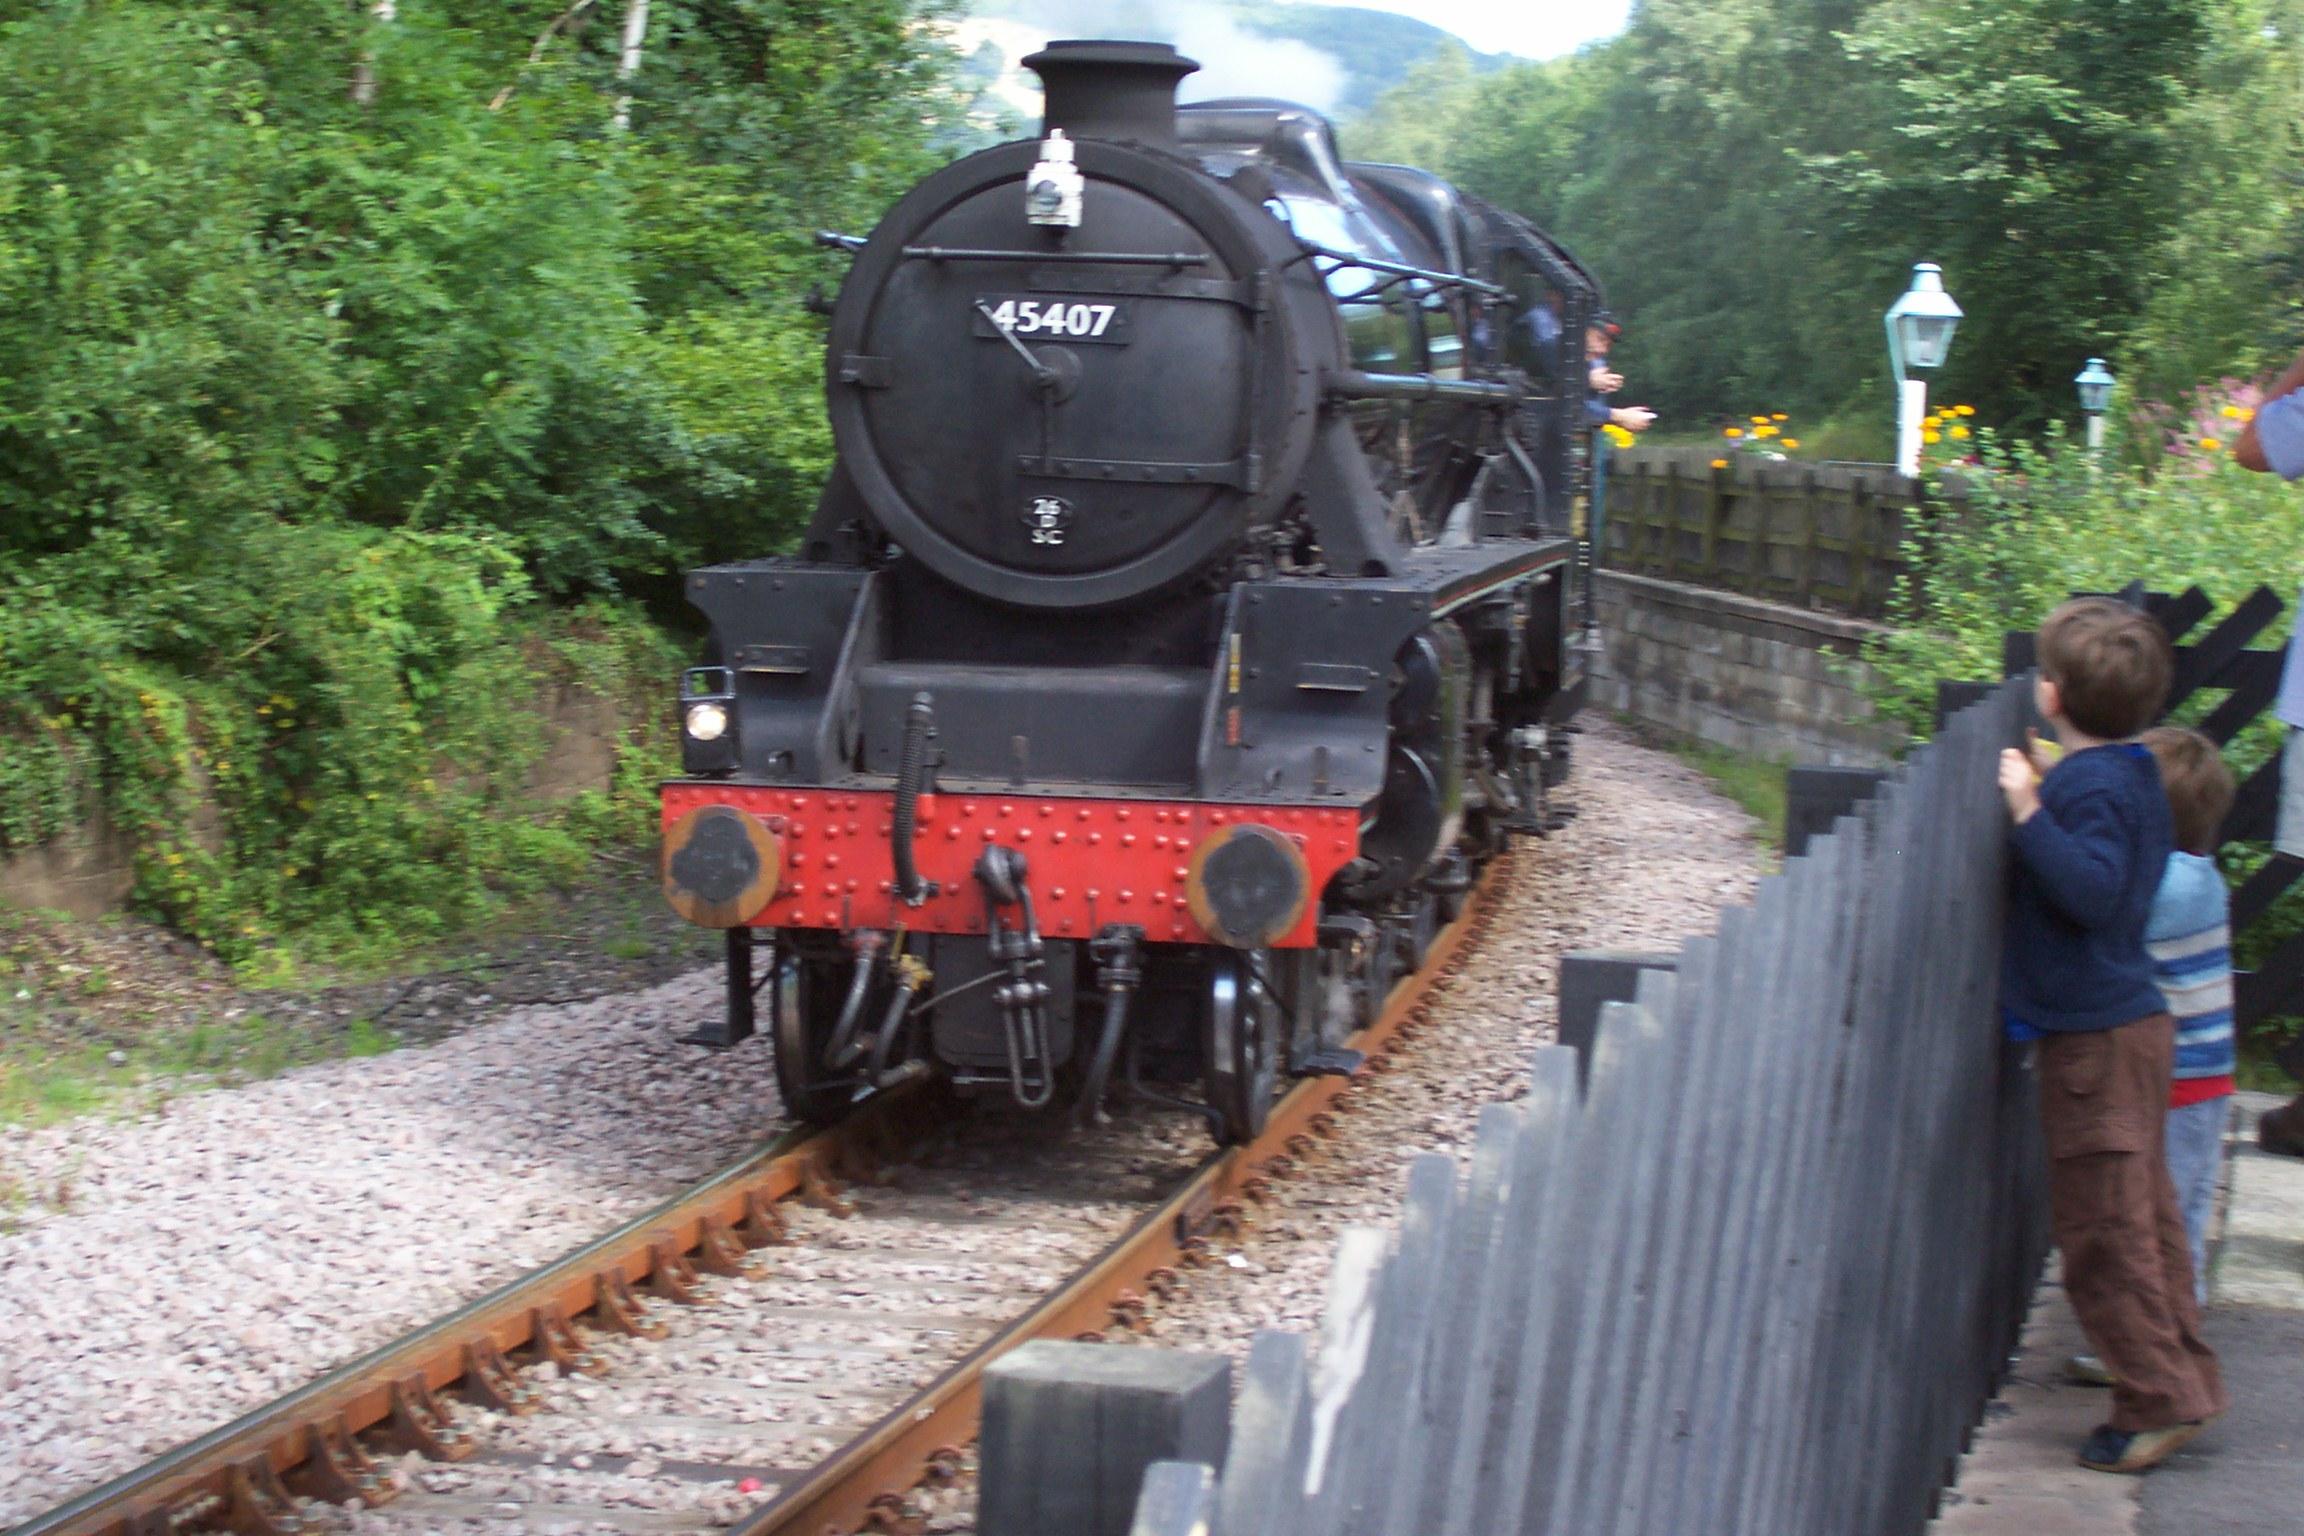 45407 arriving Grosmont